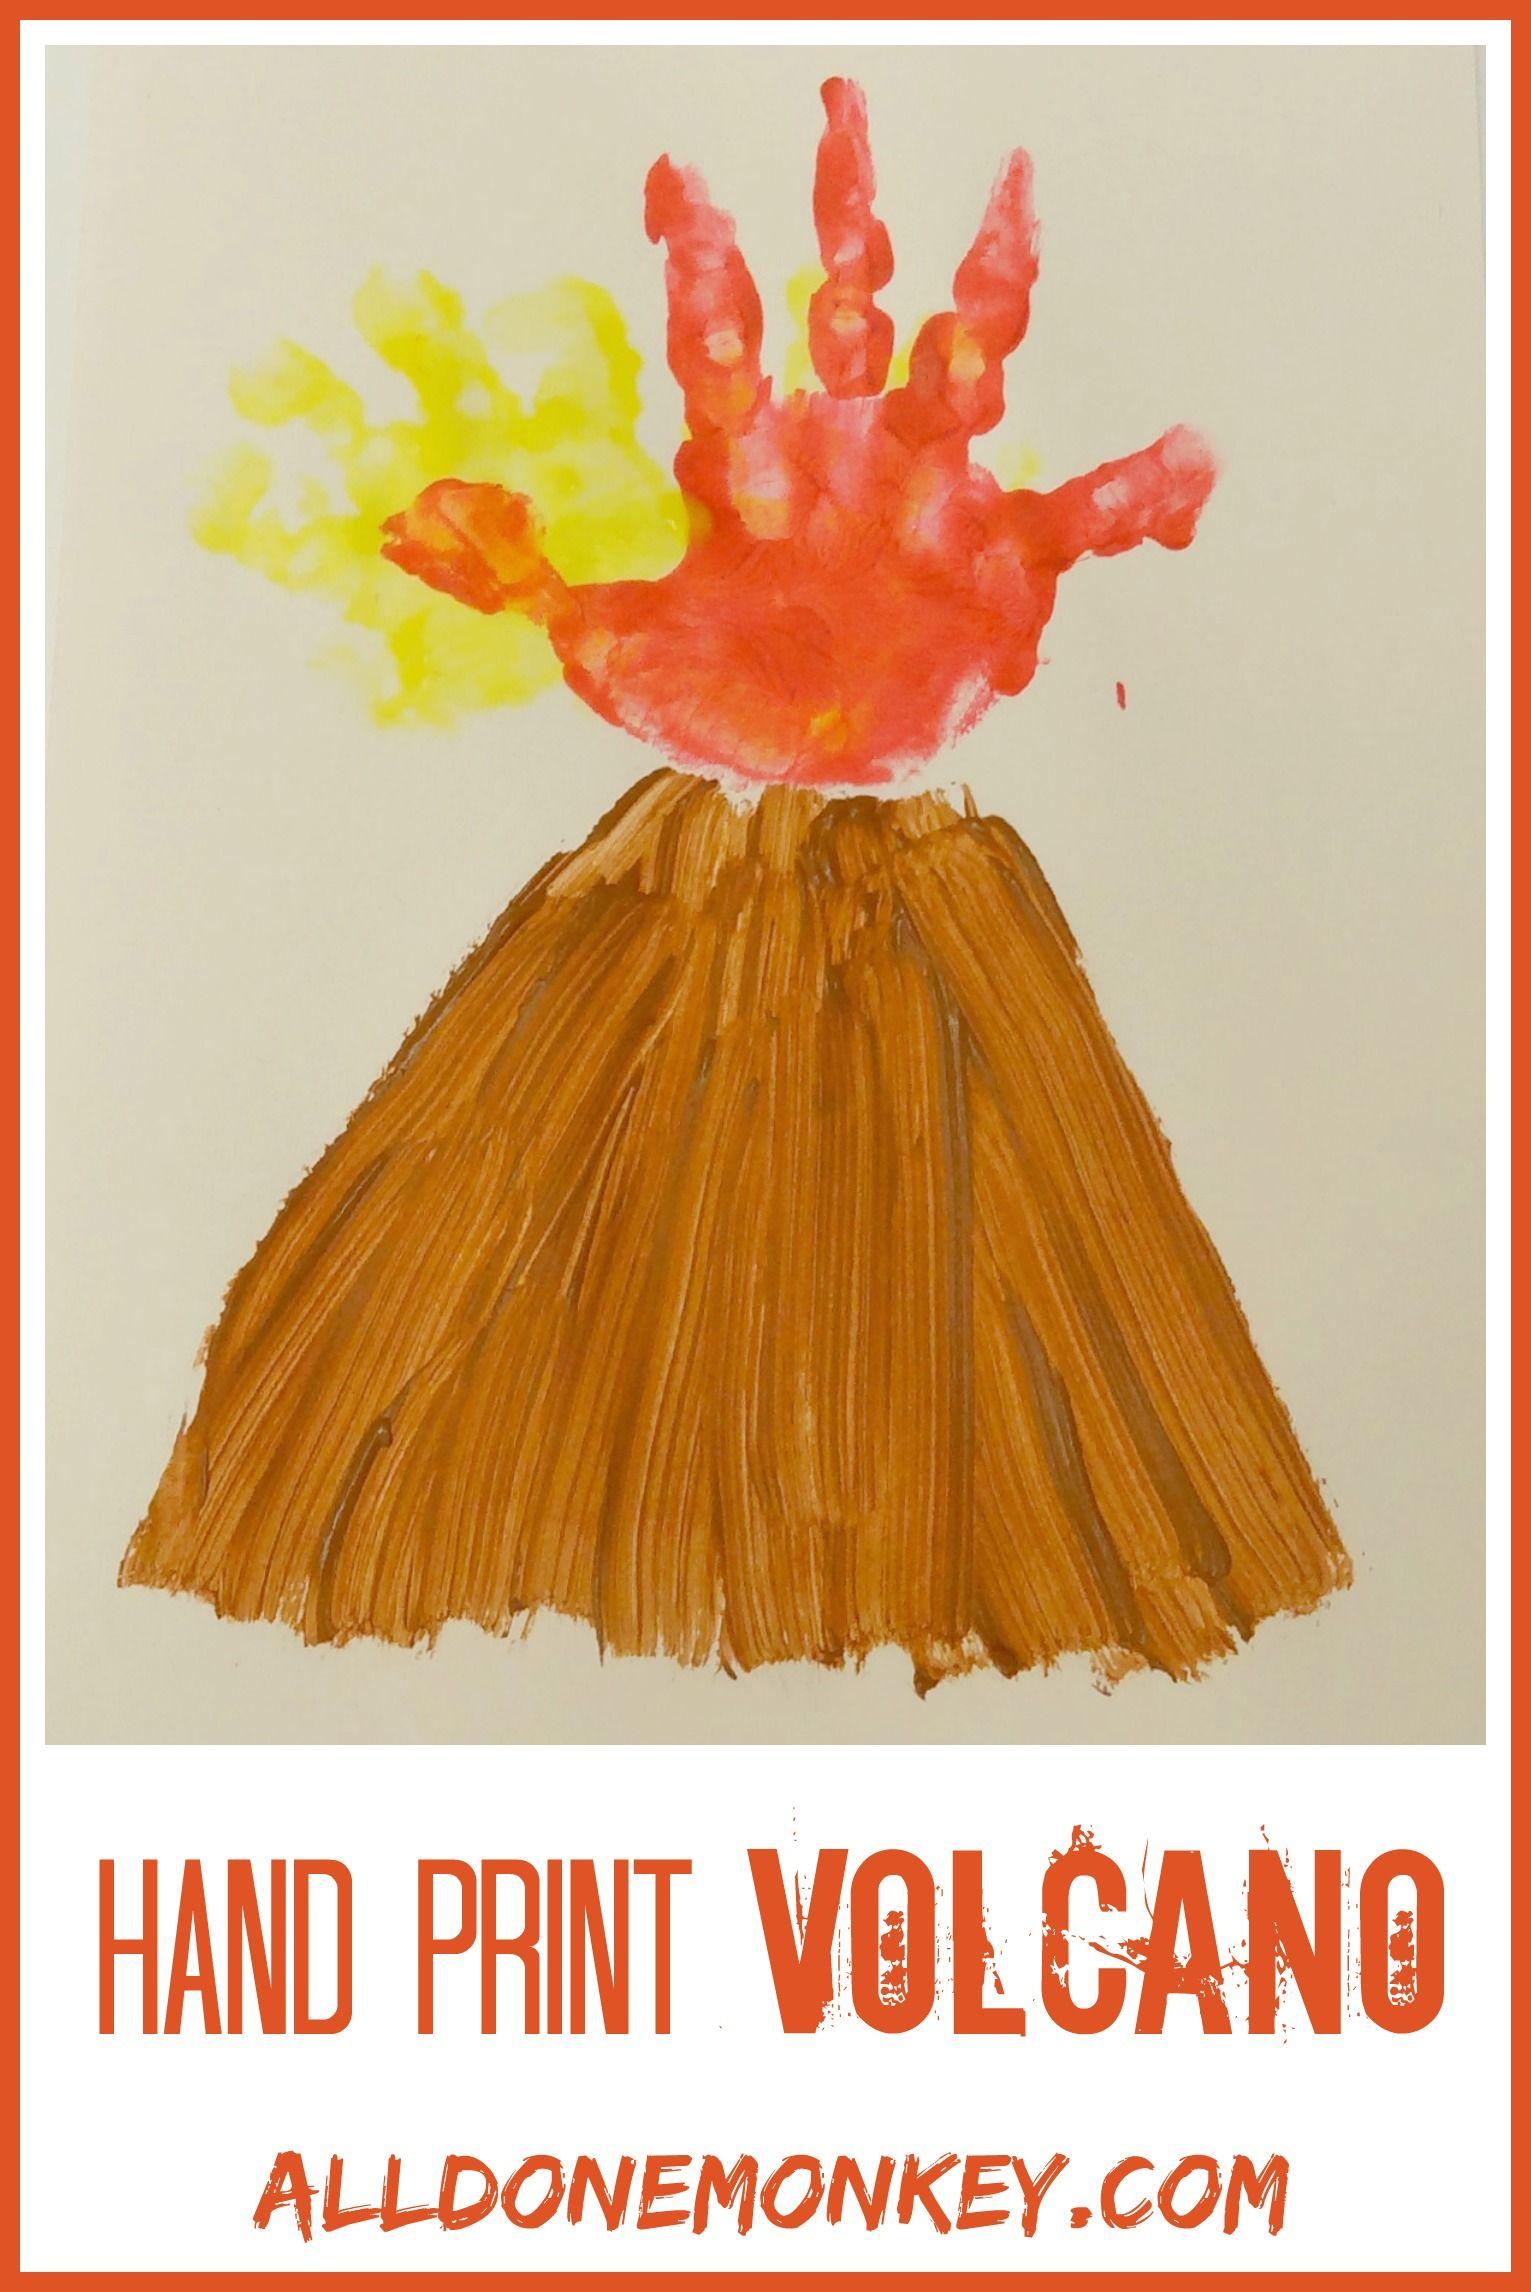 Hand Print Volcano Card